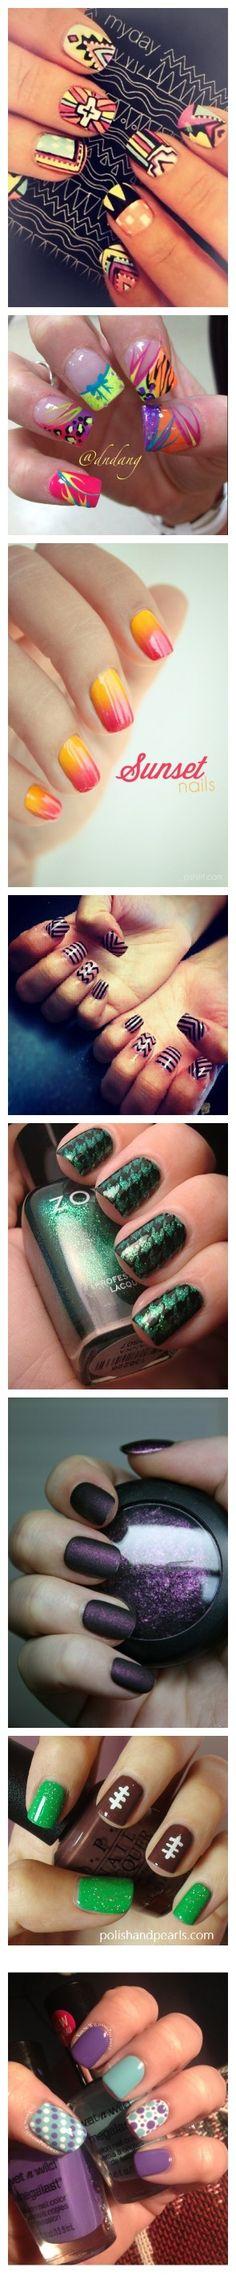 New Nail Art Ideas Tribal Simple Ideas New Nail Art, Nail Art Diy, Easy Nail Art, Cool Nail Art, Diy Nails, Great Nails, Fabulous Nails, Gorgeous Nails, Nail Polish Designs